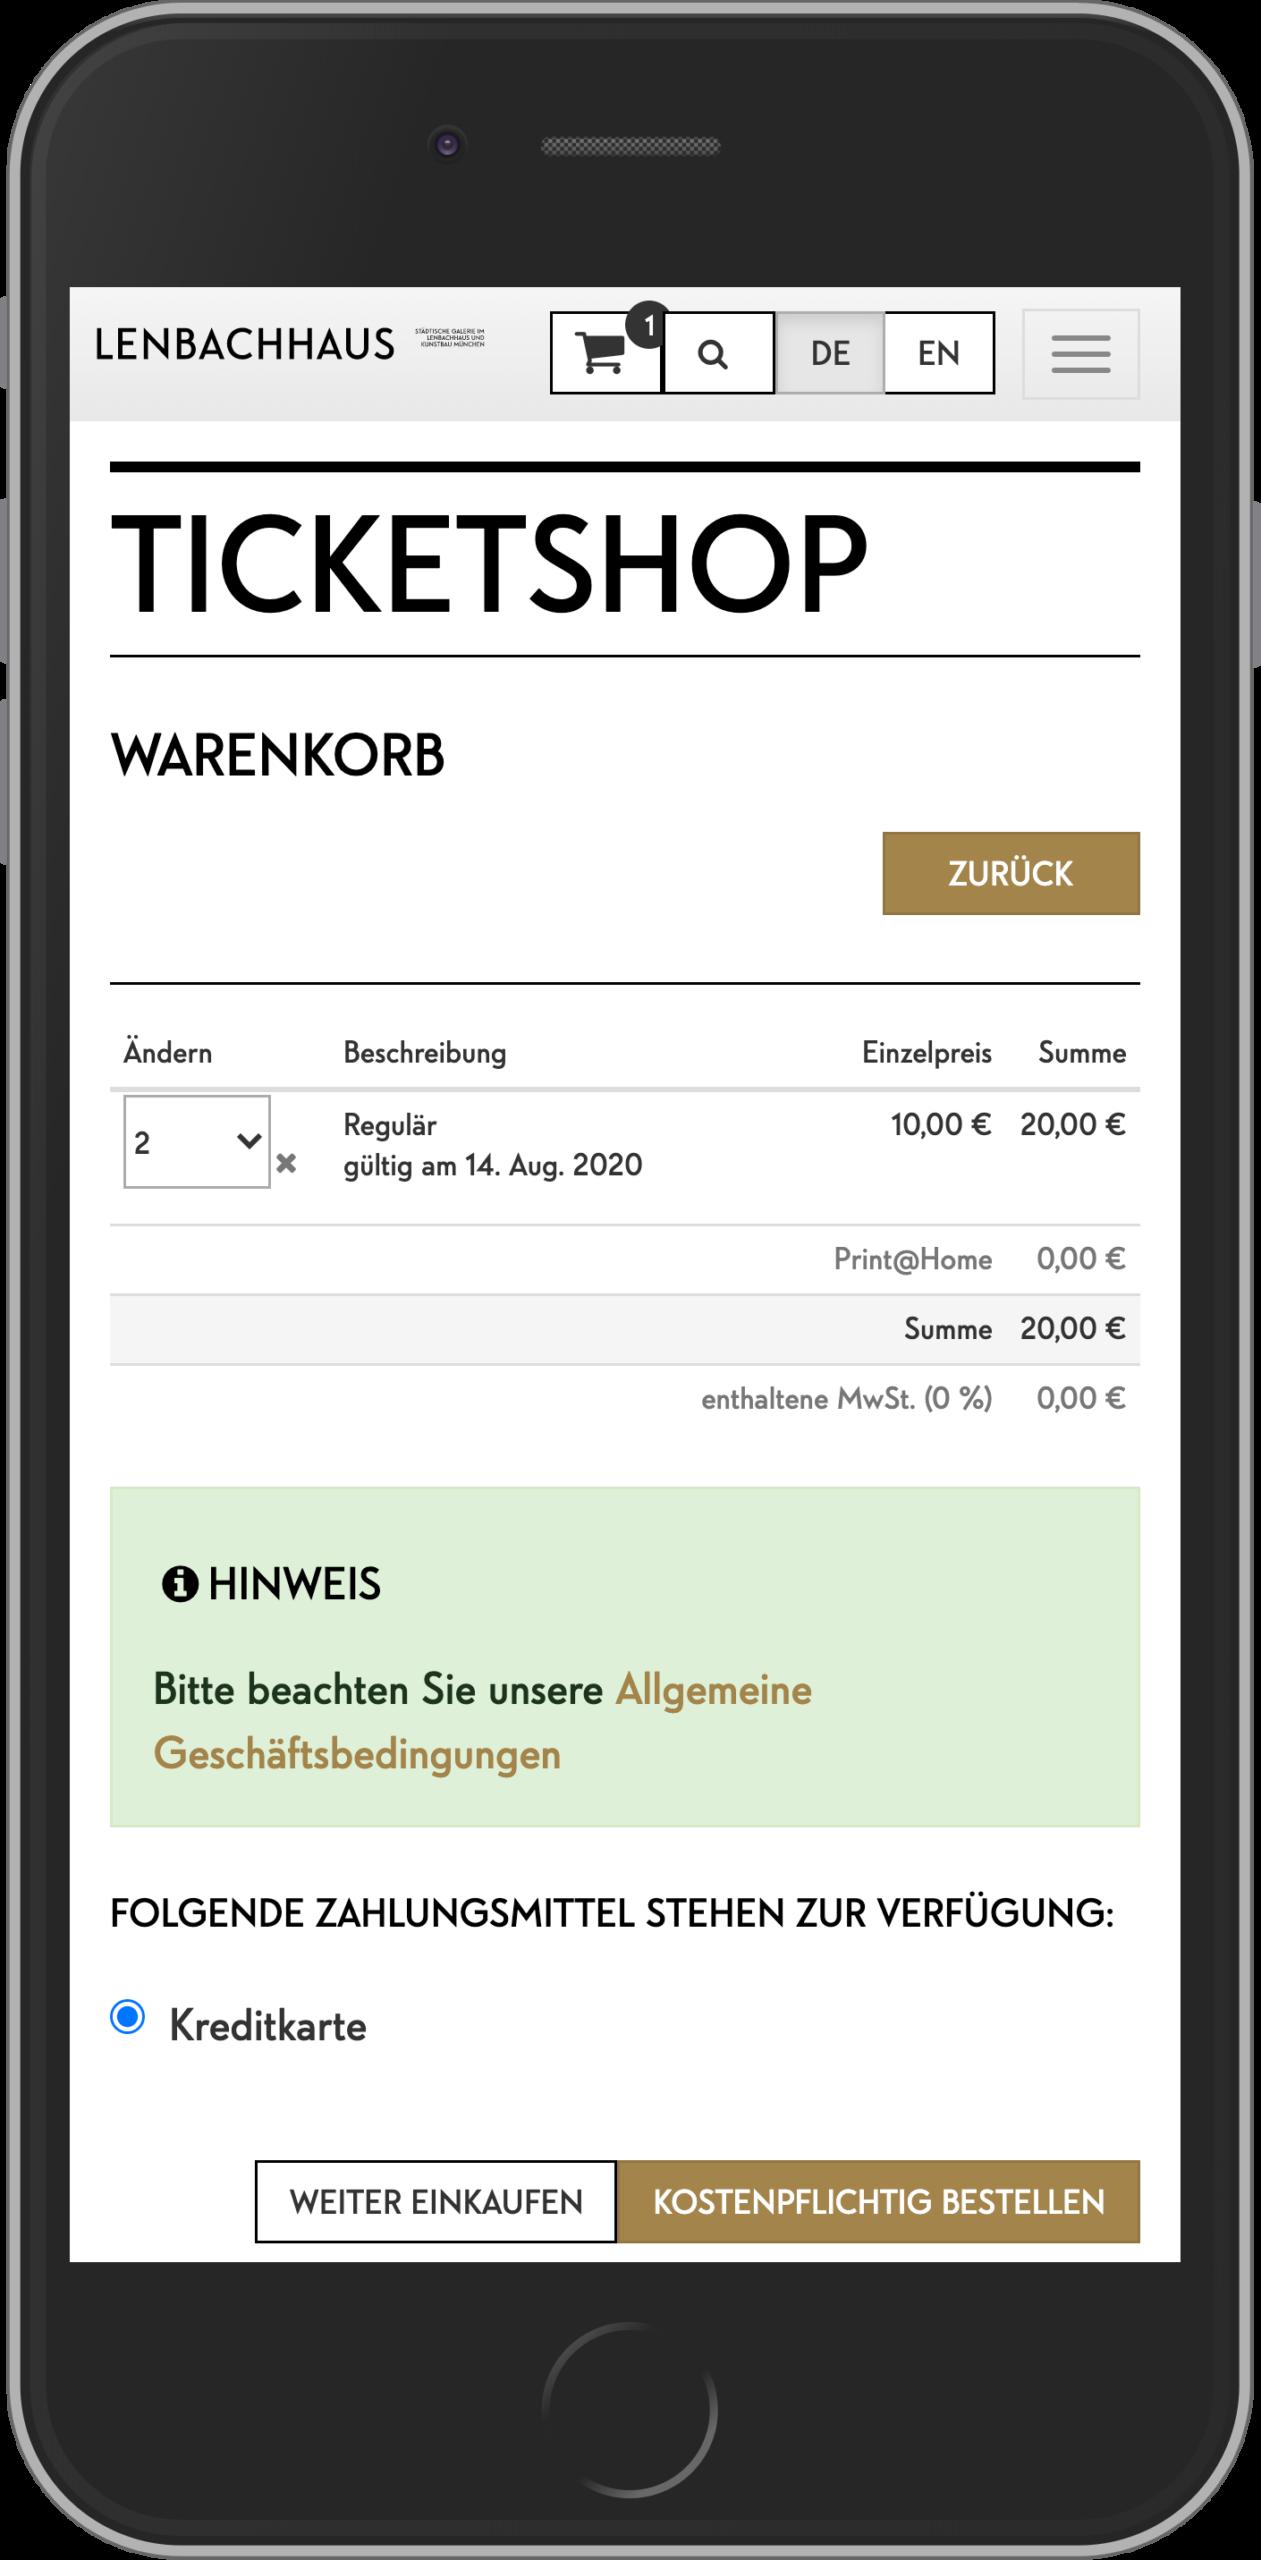 Mobile Ansicht des Warenkorbs im Online Shop des Lenbachhaus